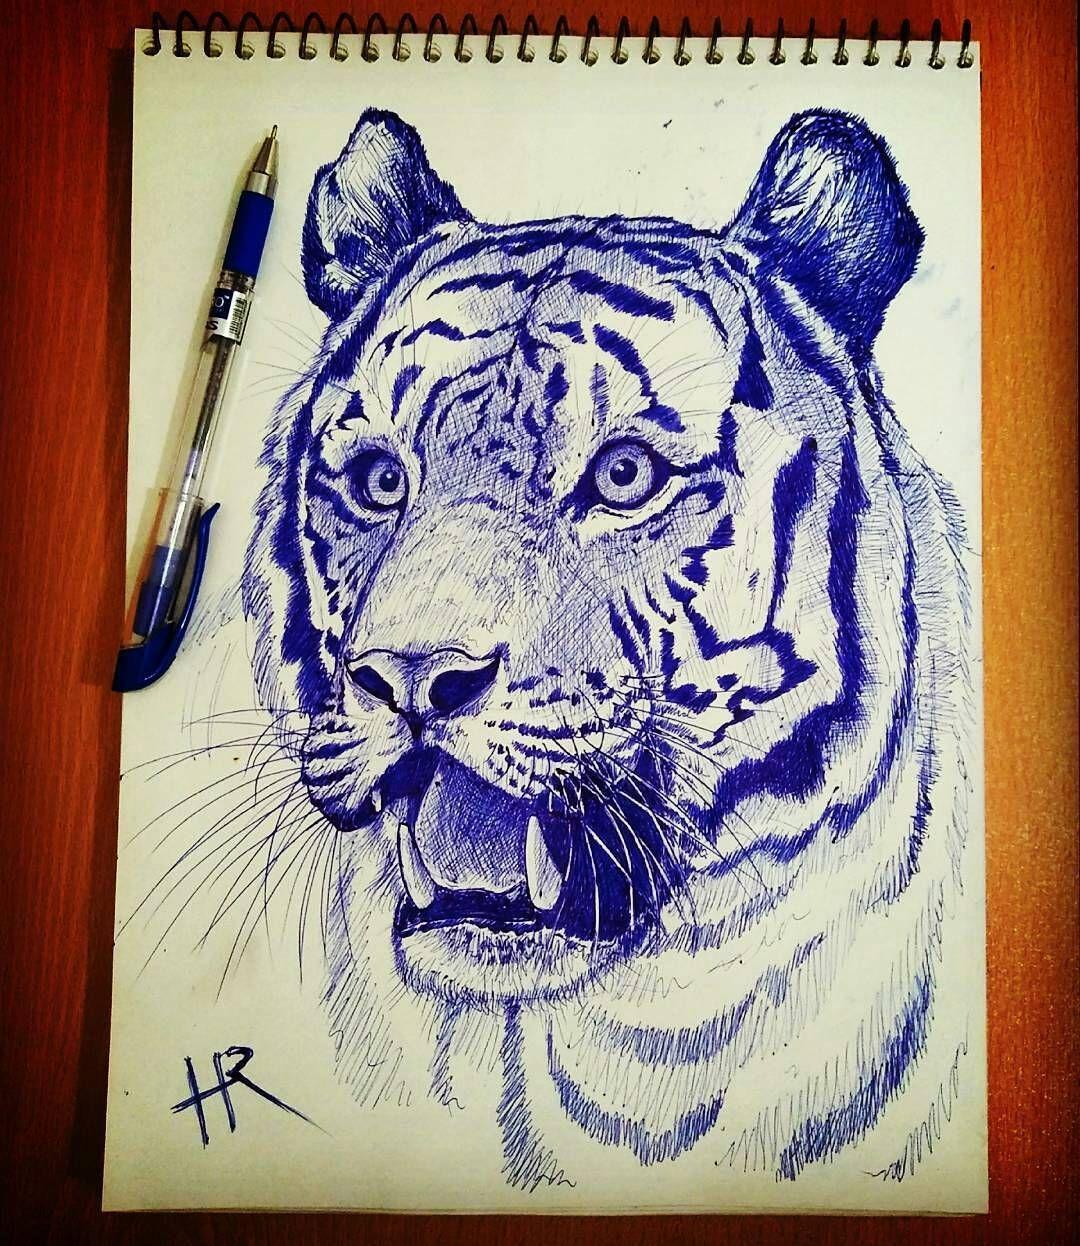 Ballpoint Pen Sketch By Hamidrezafallaho Ig Follow Artgully For More Pen Realism Artgully Ink Pen Art Ballpoint Pen Art Pen Sketch